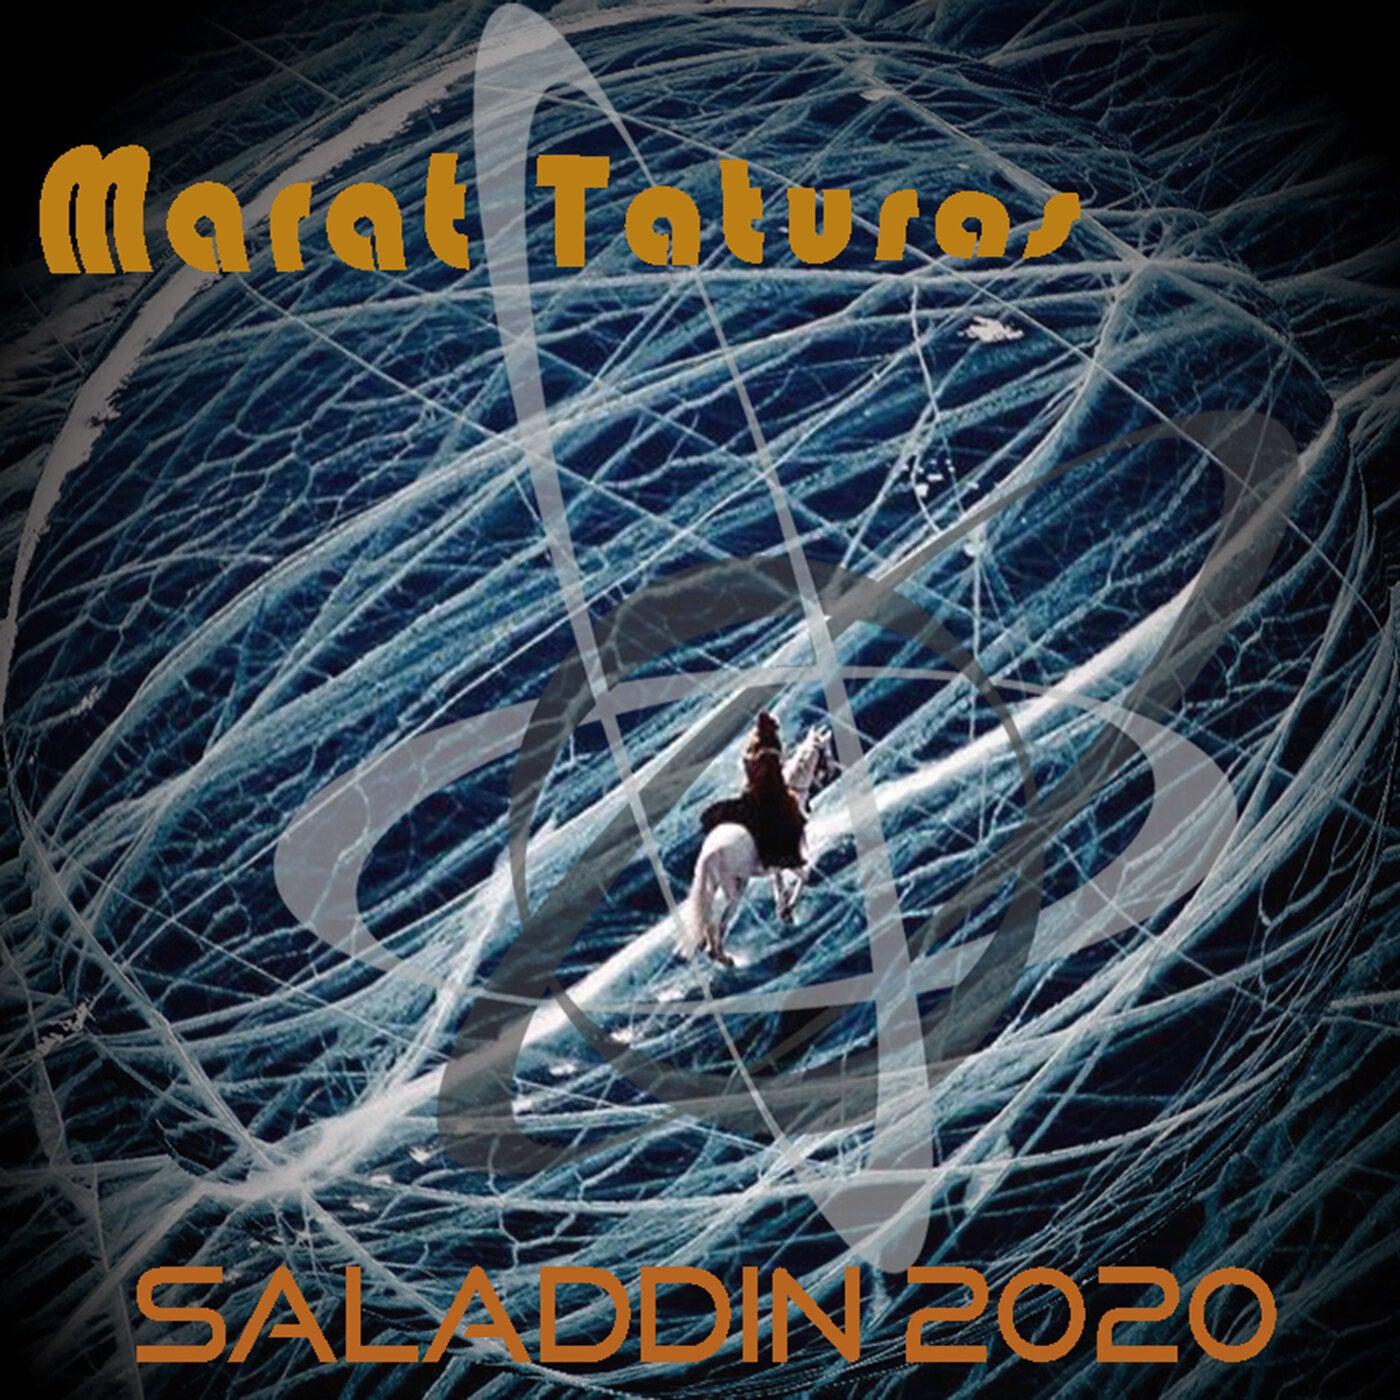 Marat Taturas – Saladdin 2020 [Solaris Records]